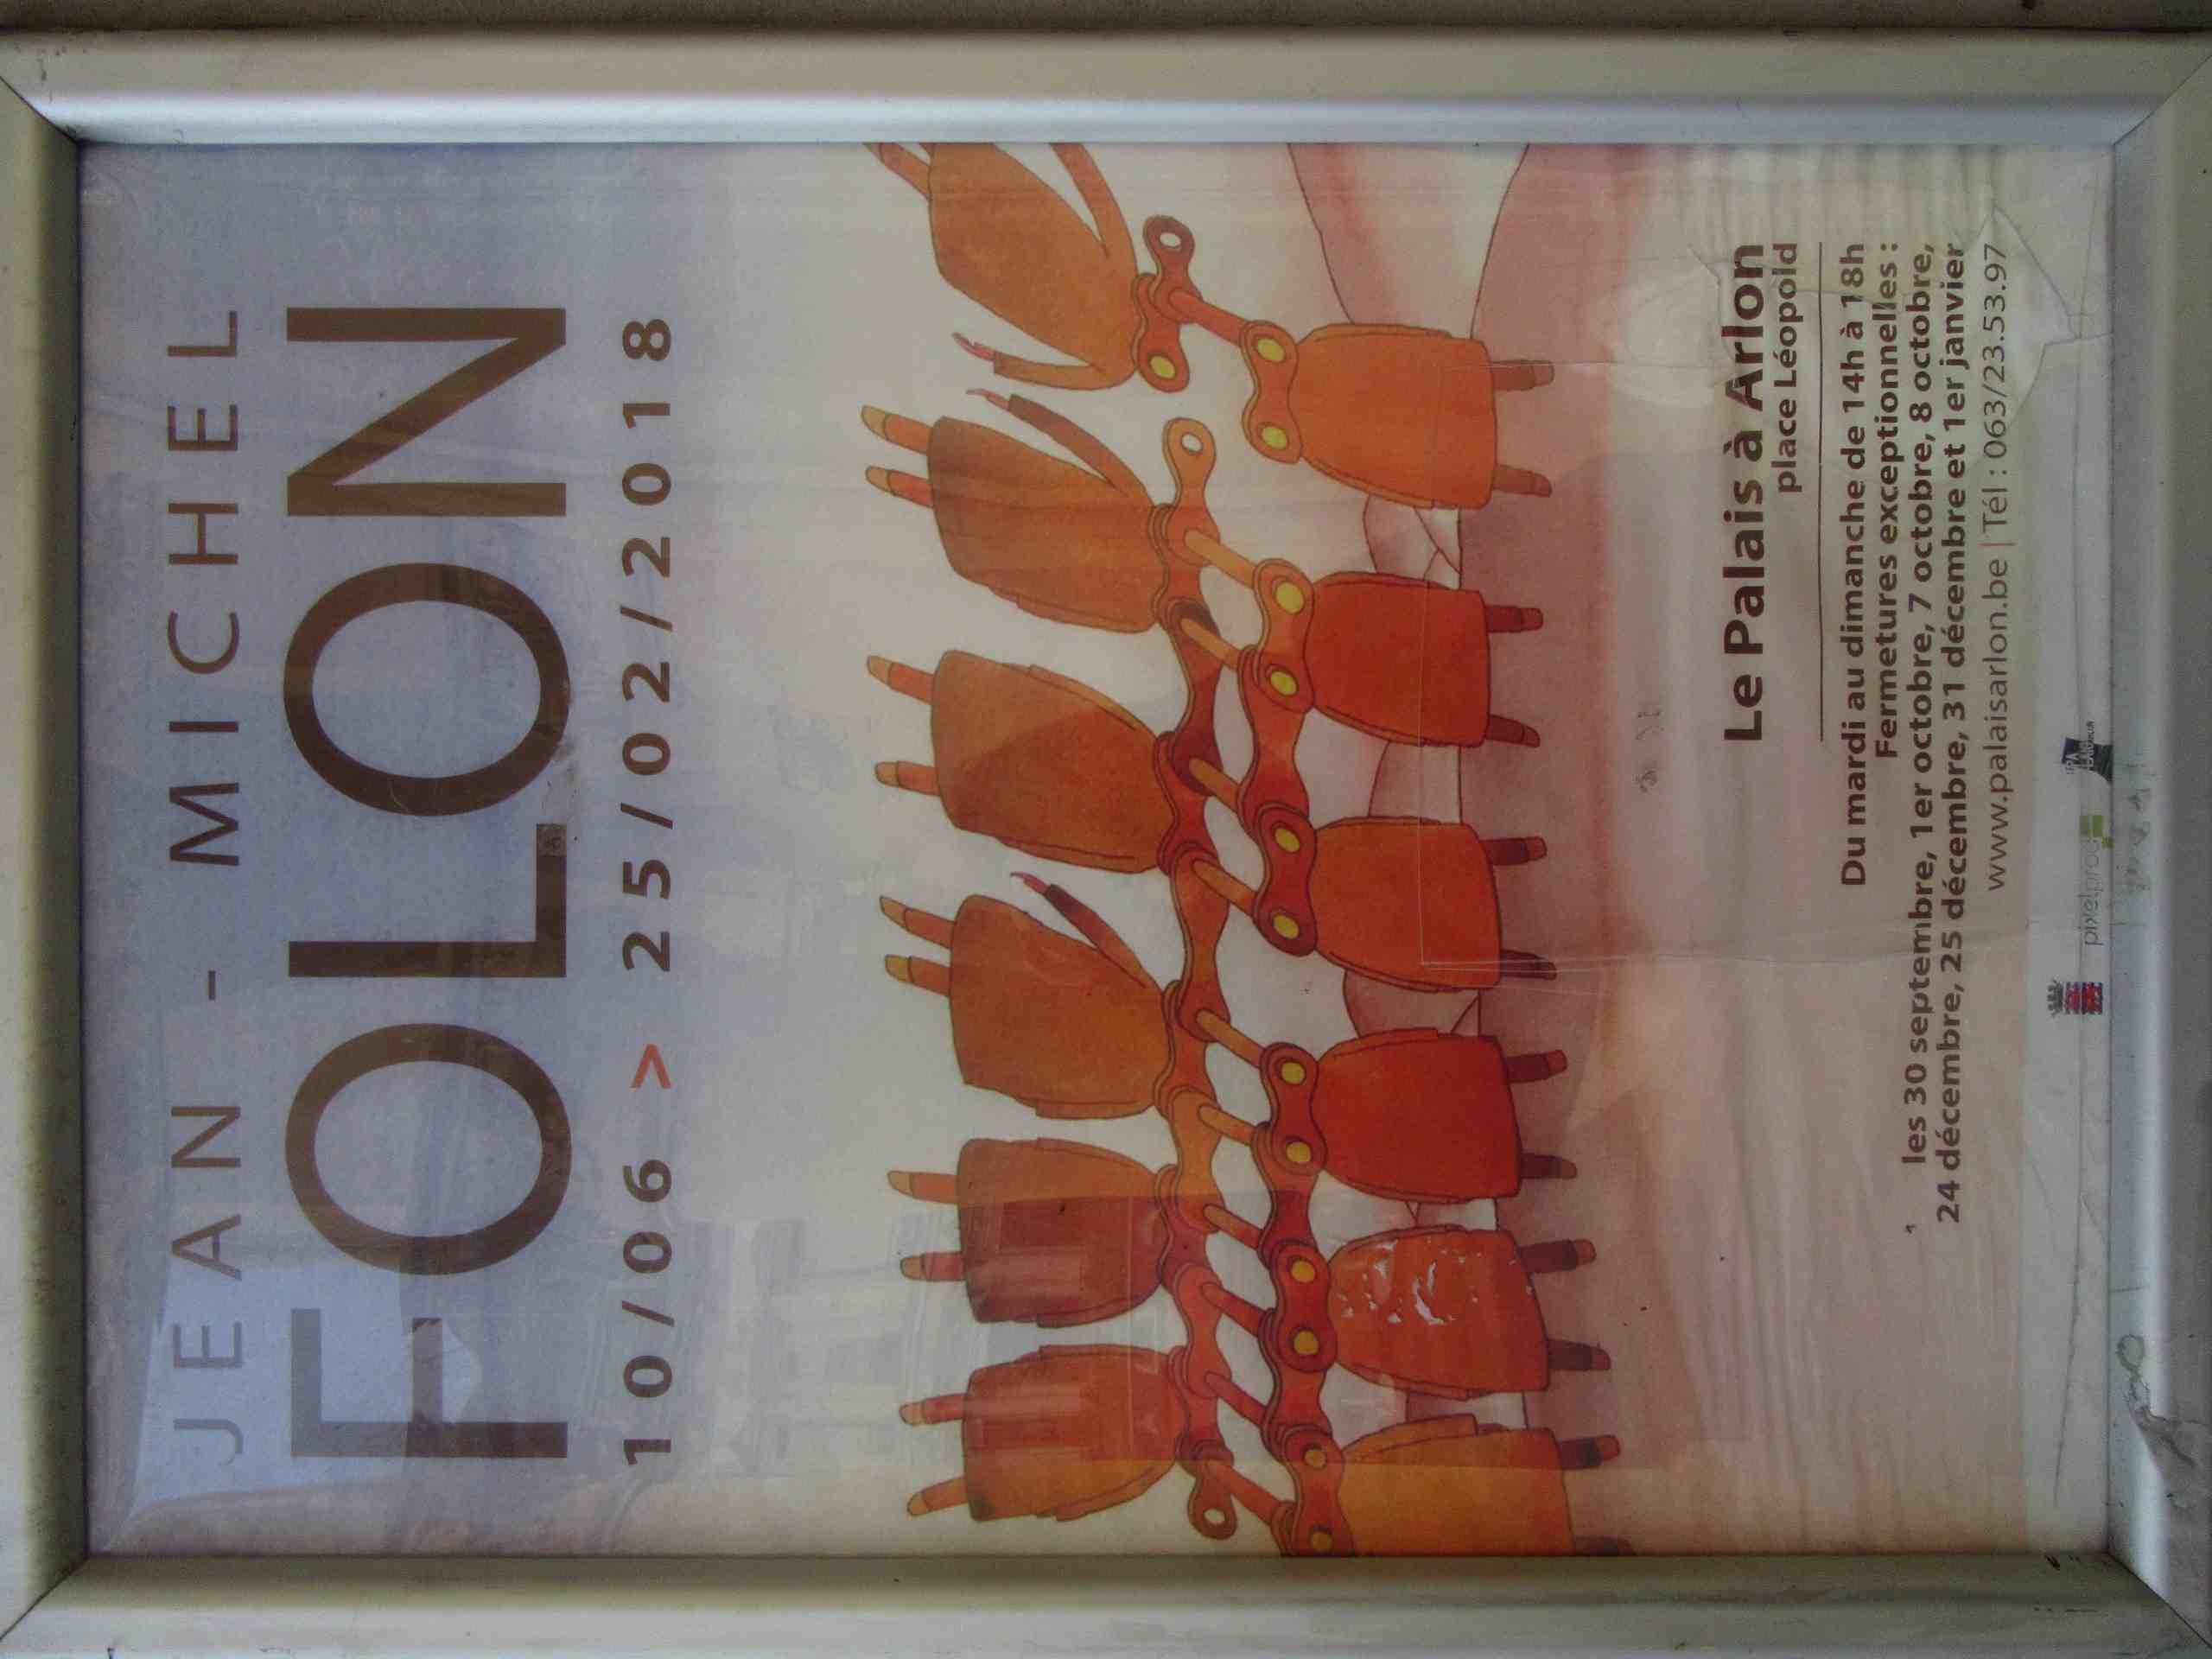 Exposition Folon à Arlon